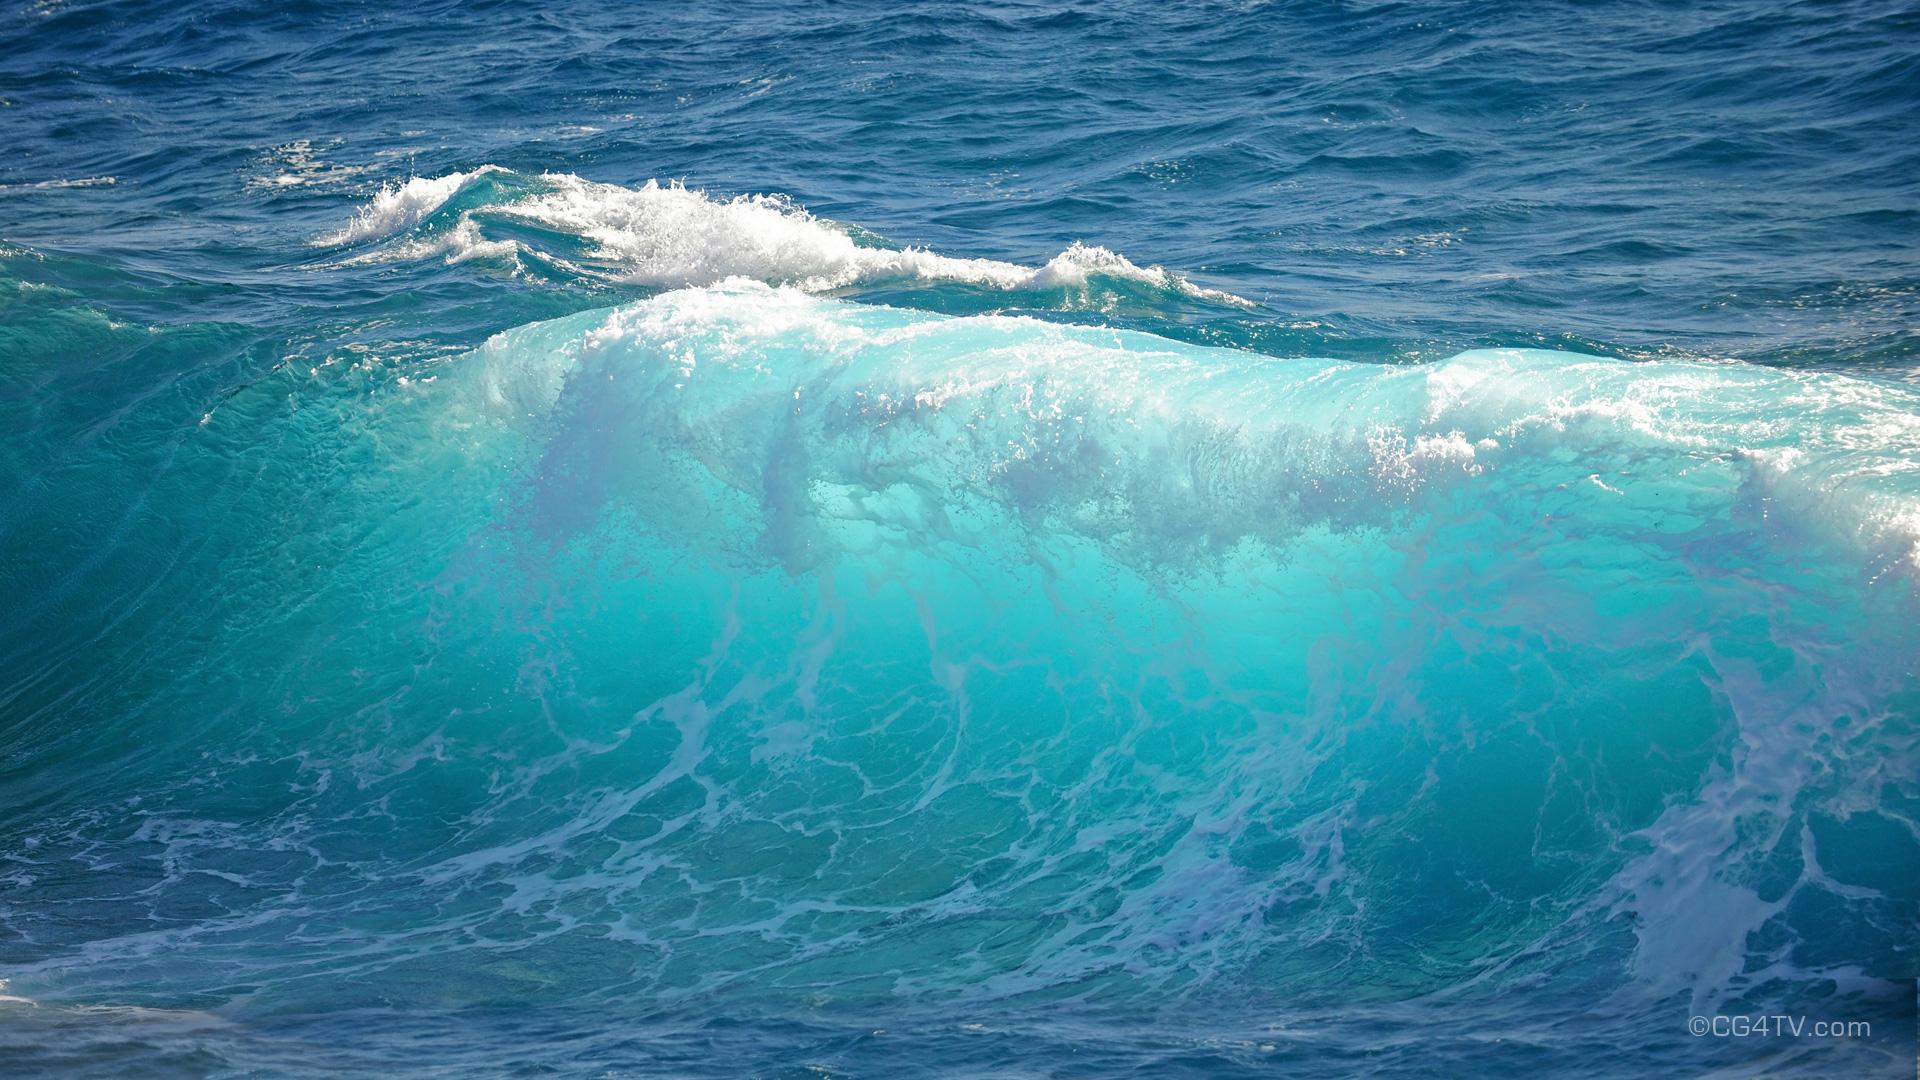 ocean waves wallpaper moving